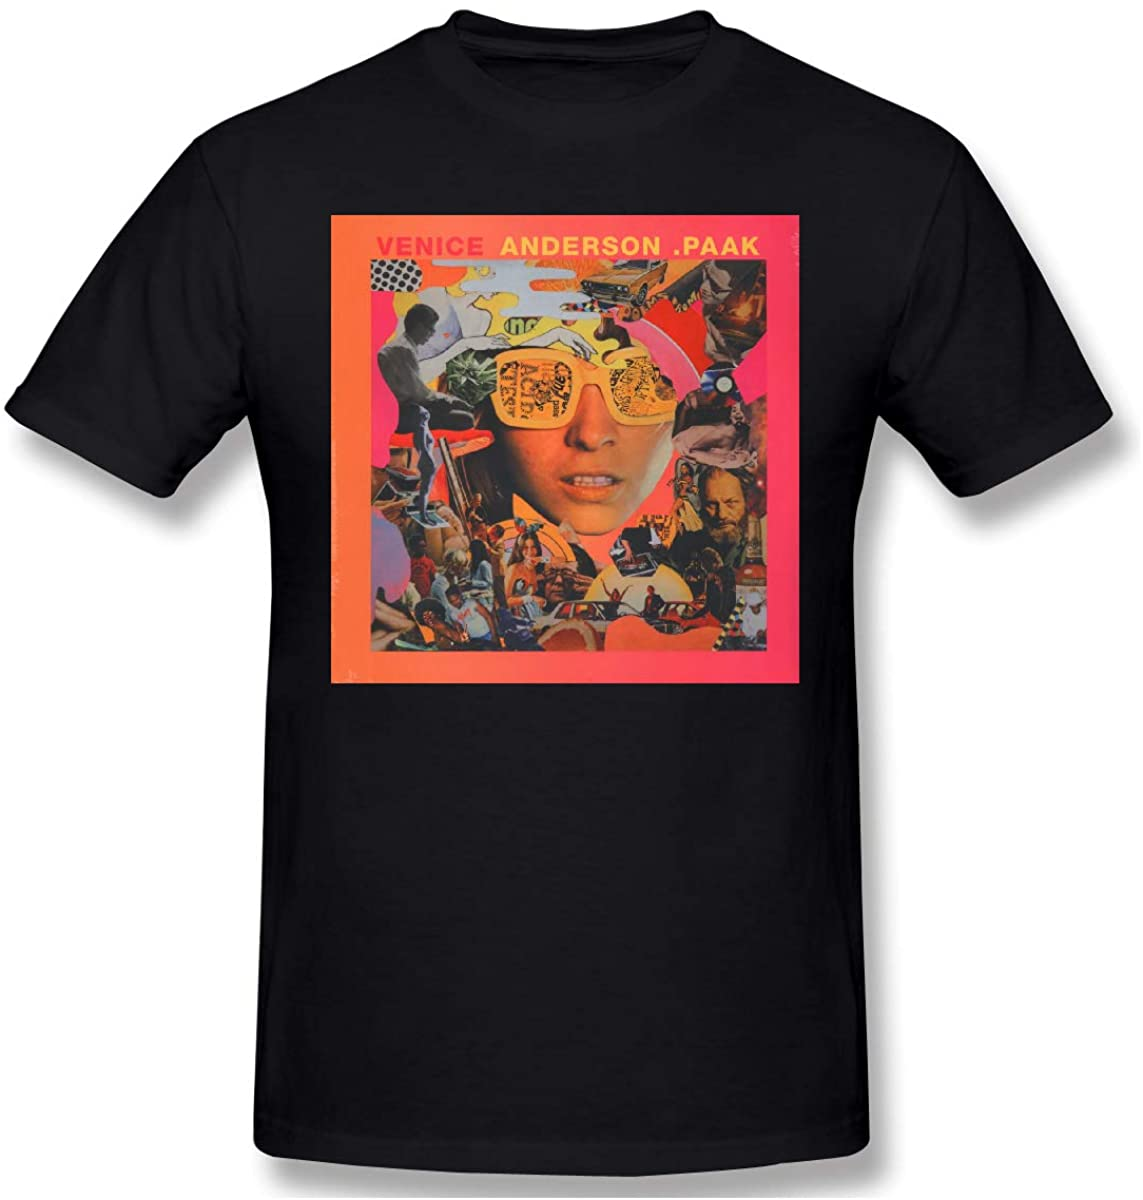 NaohBent Anderson PaakVenice Mens Basic Cotton Short Sleeve T-Shirt Fashion Shirts Black